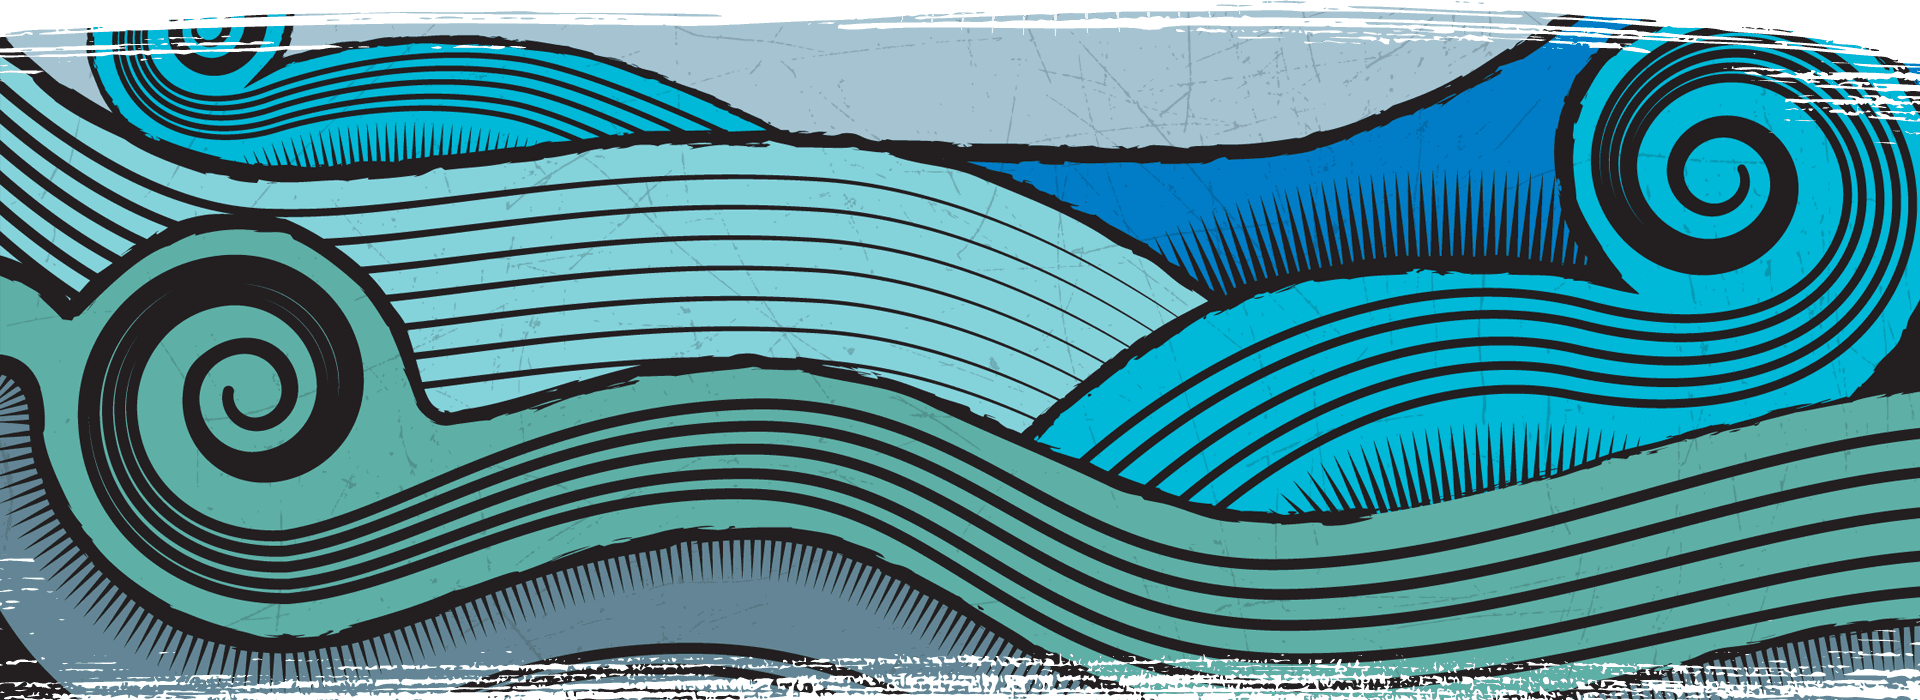 Blue decorative patterns